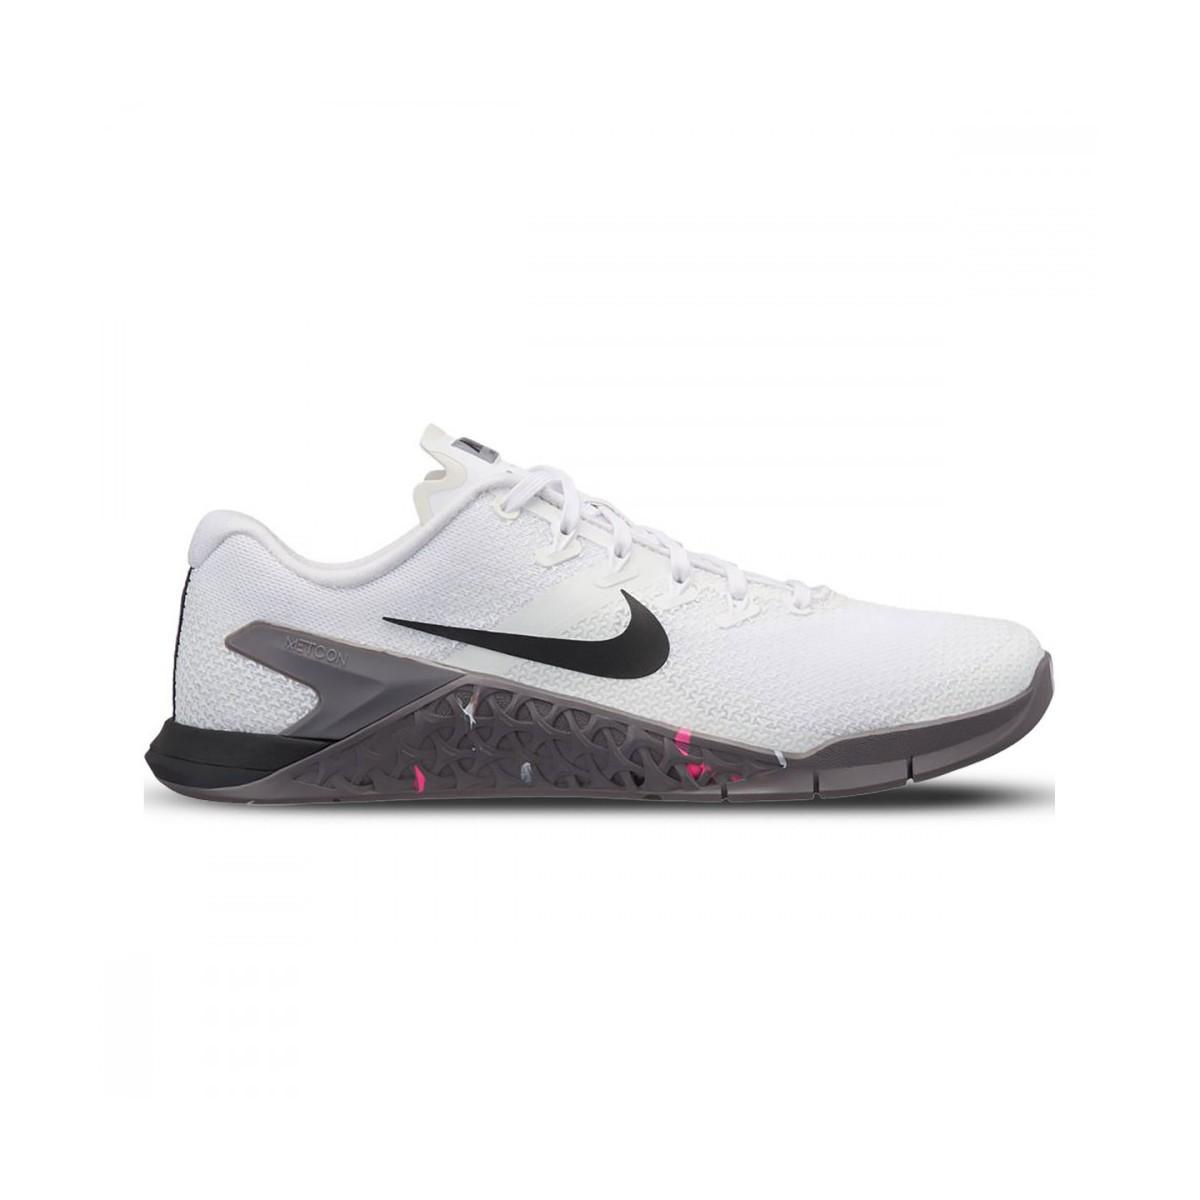 Scarpa Nike Bianco Donna 4 Scarpe 105 Metcon 924593 Training Wom dAqr6g